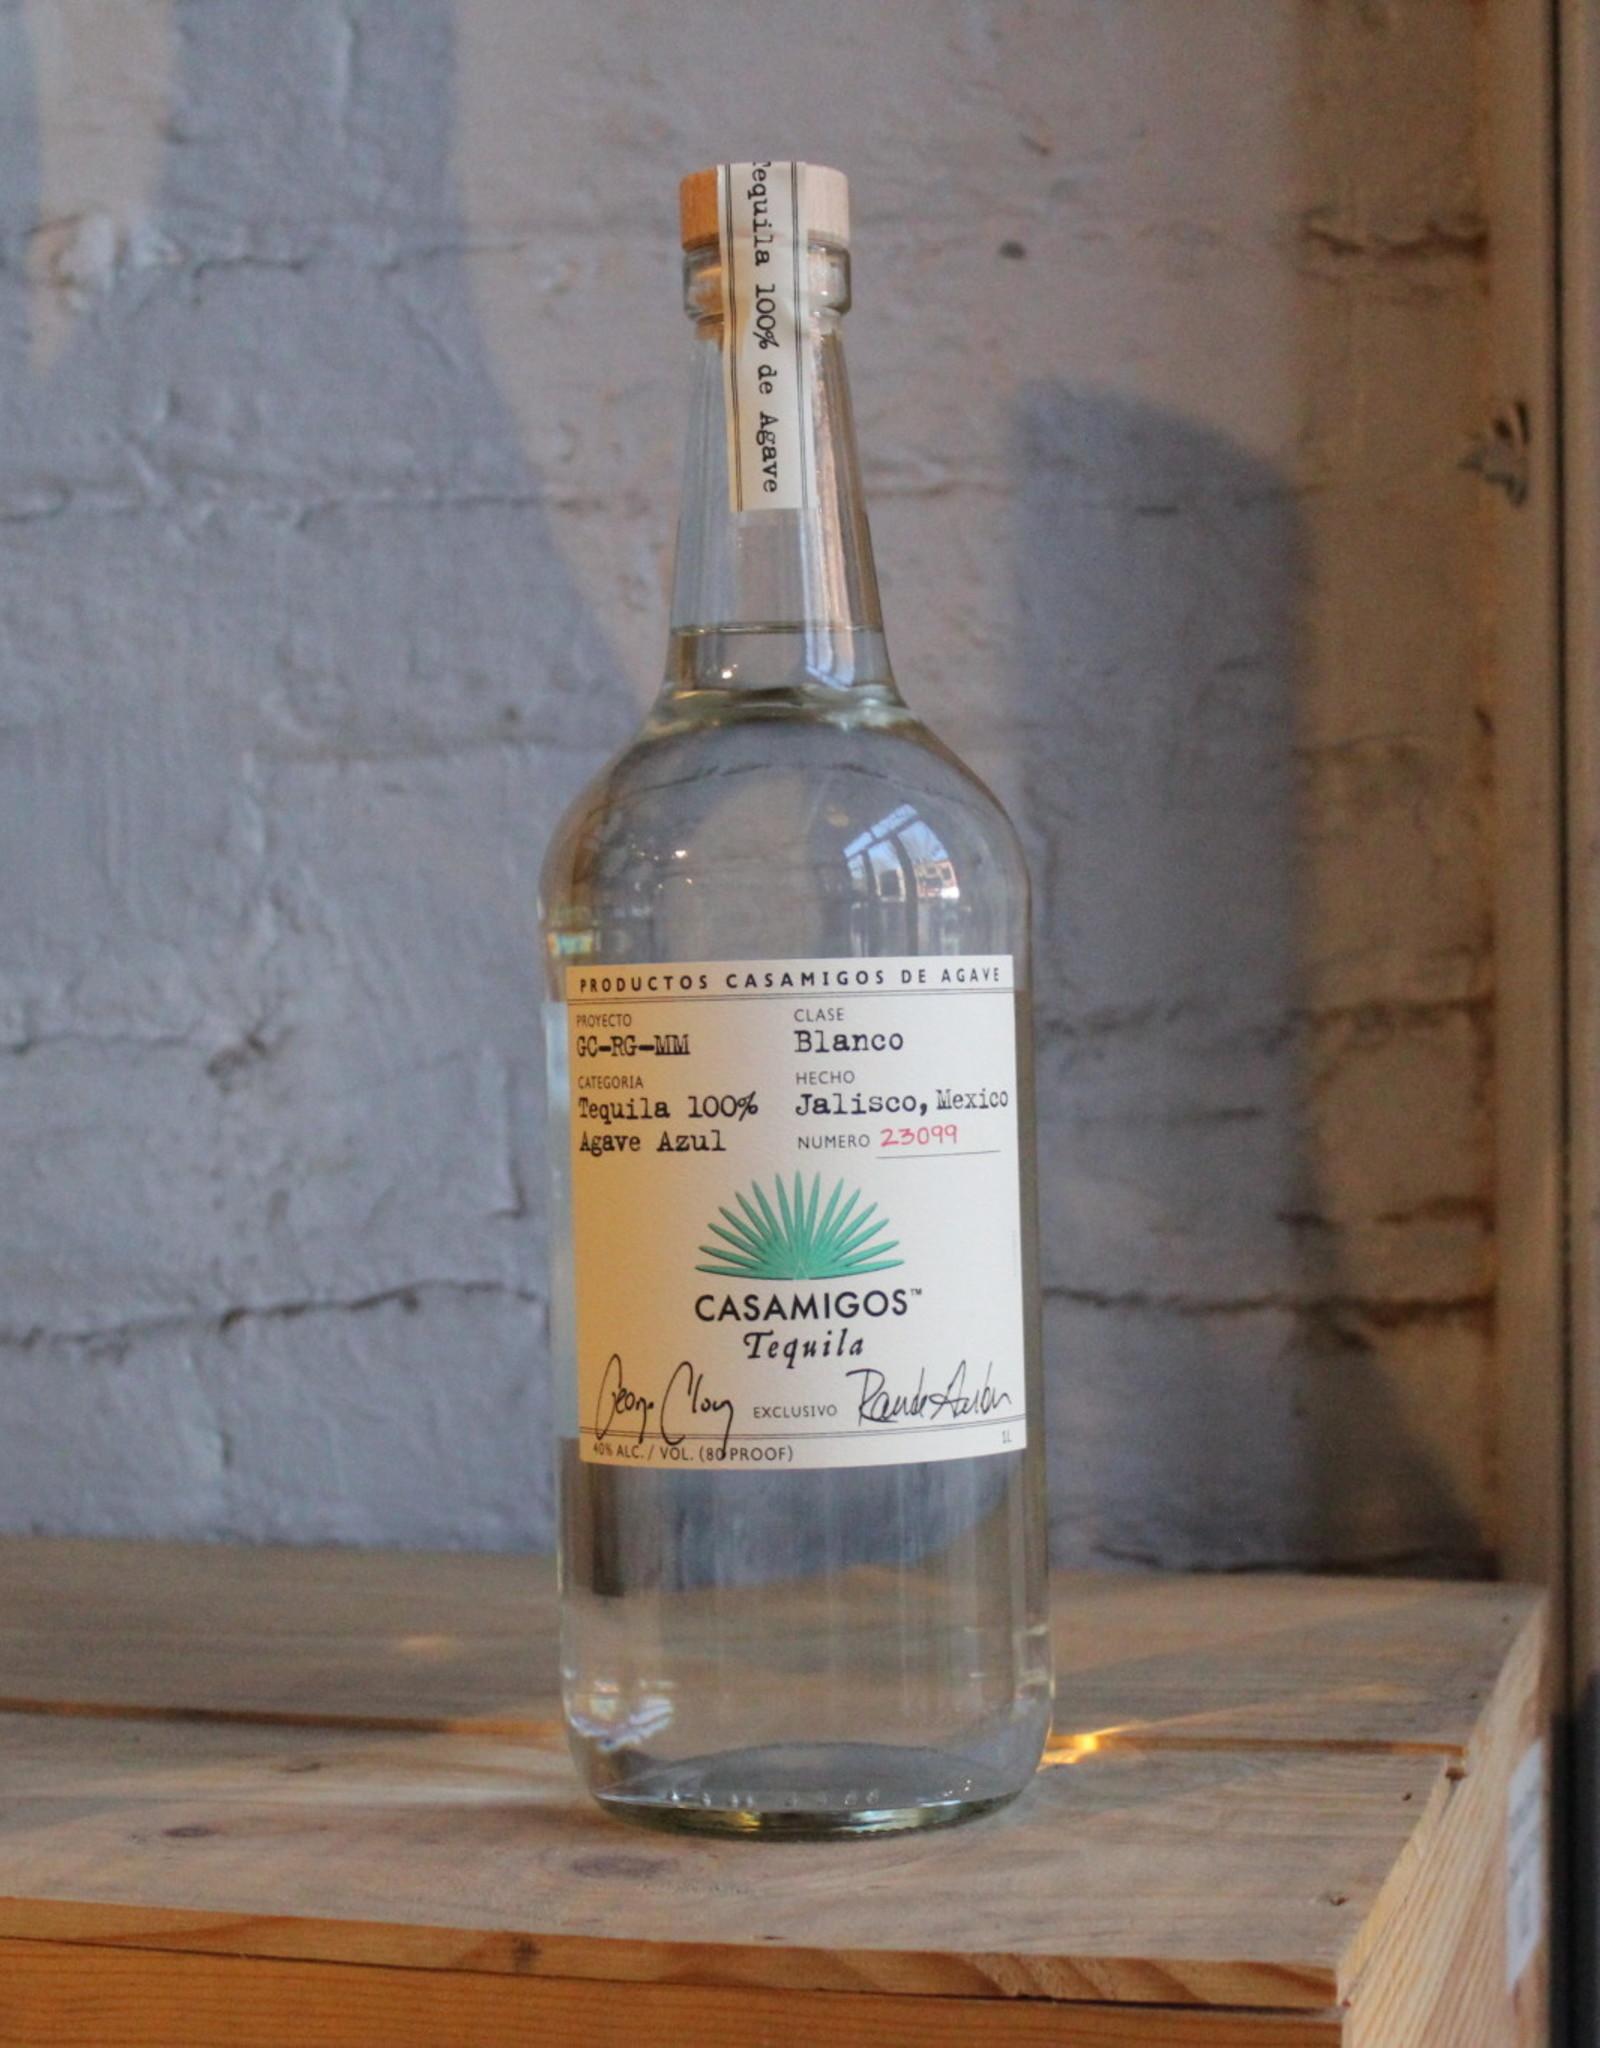 Casamigos Blanco 100% Blue Agave Tequila - Jalisco, Mexico (1Ltr)